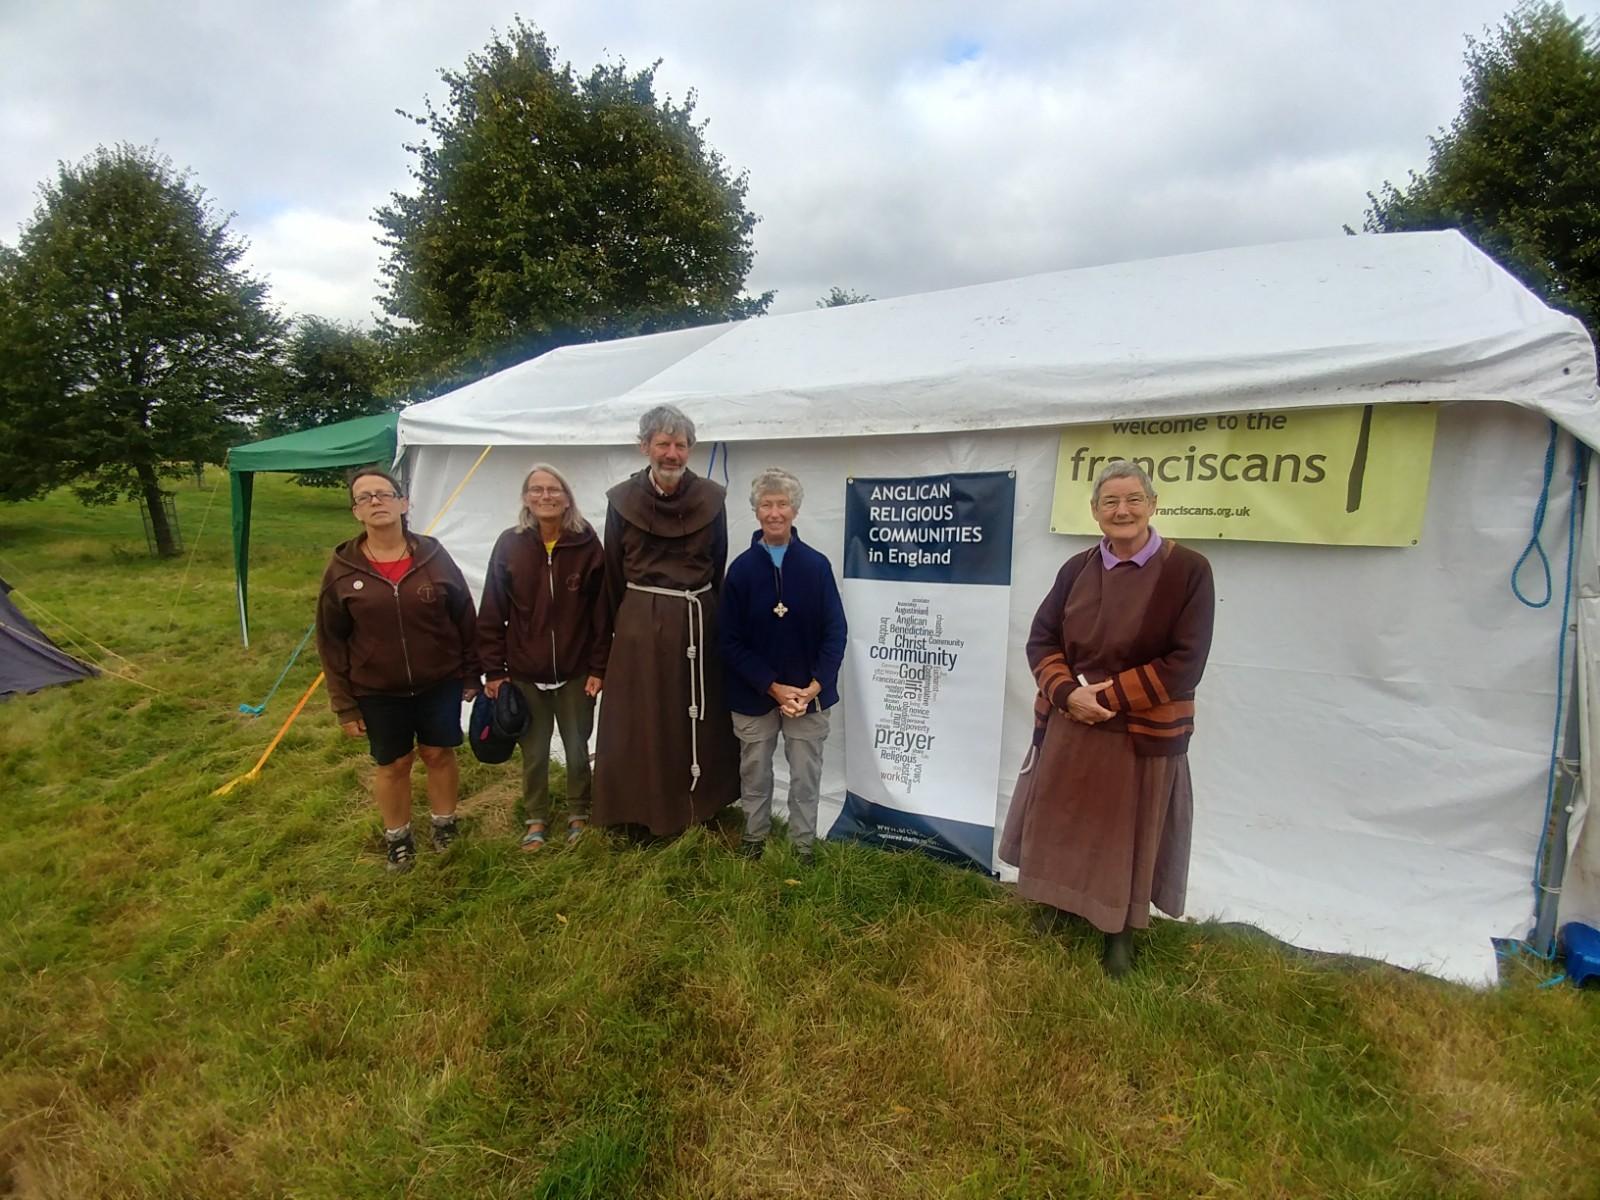 Franciscans at Prospect Farm Gathering